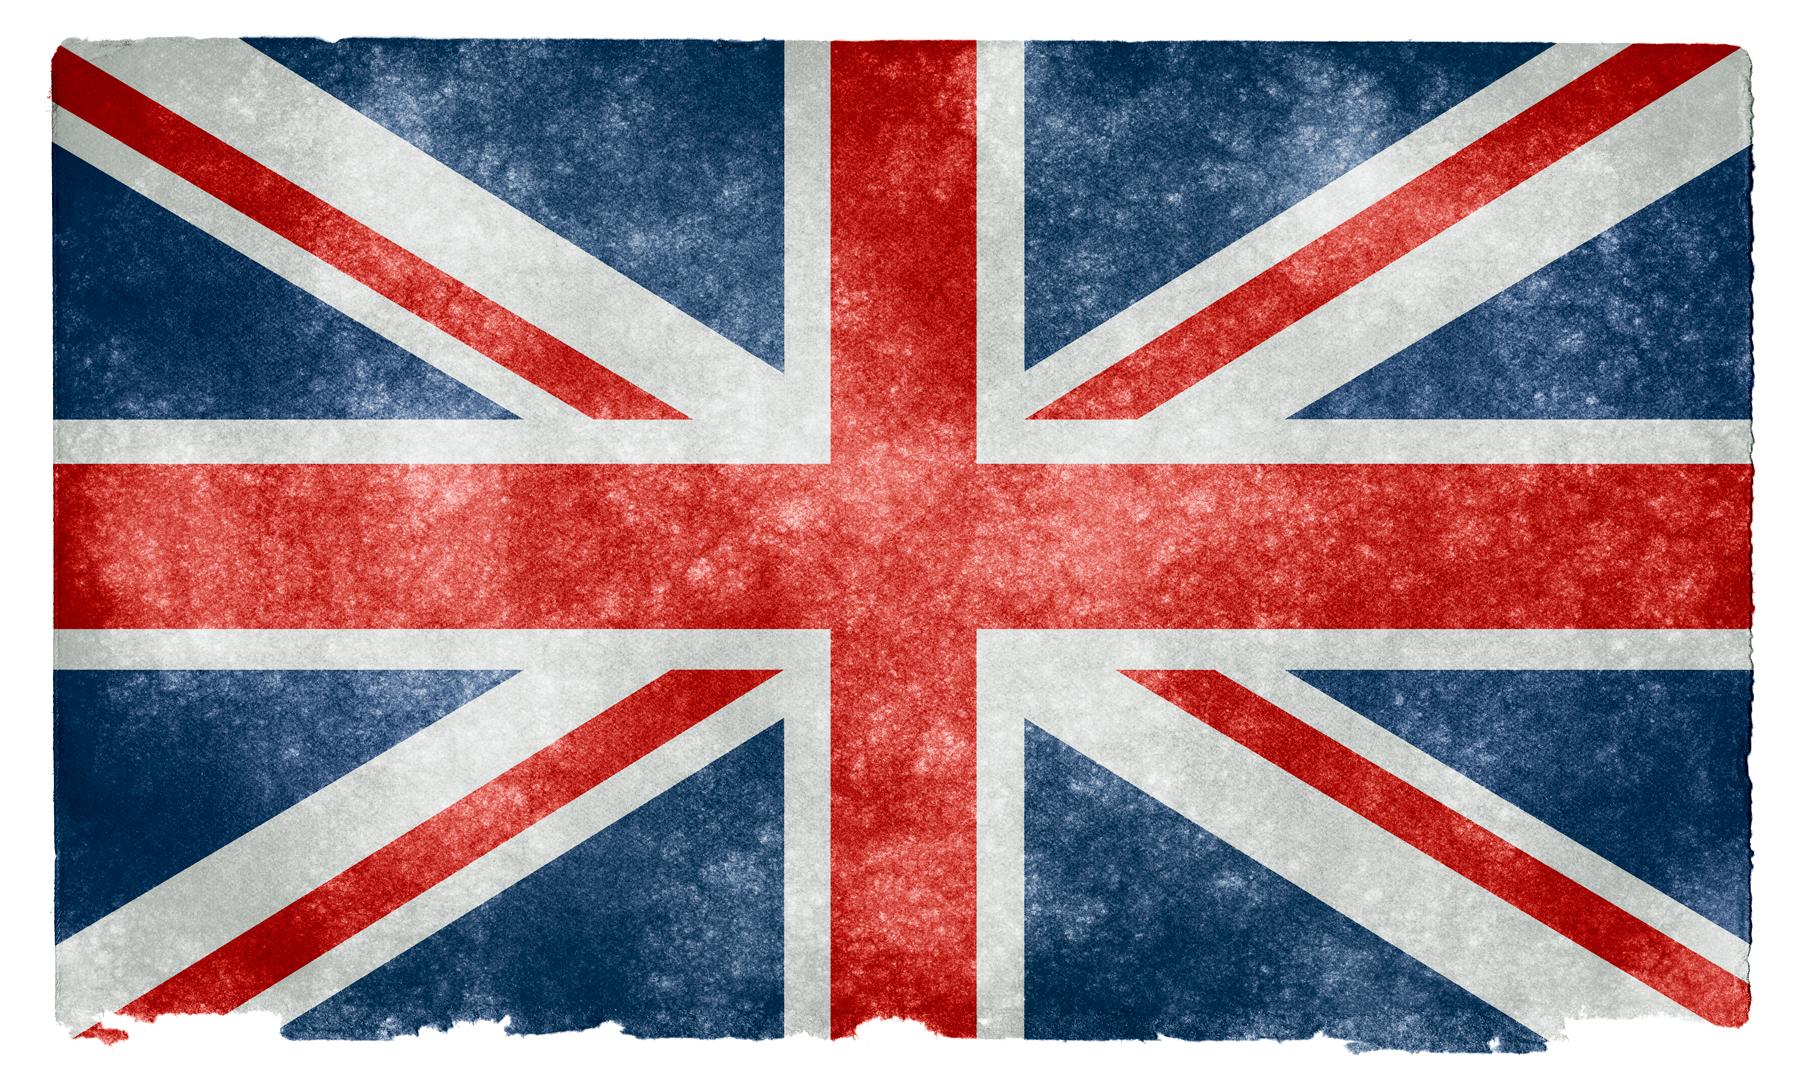 UK Grunge Flag HD Wallpaper | Wide Screen Wallpaper 1080p,2K,4K